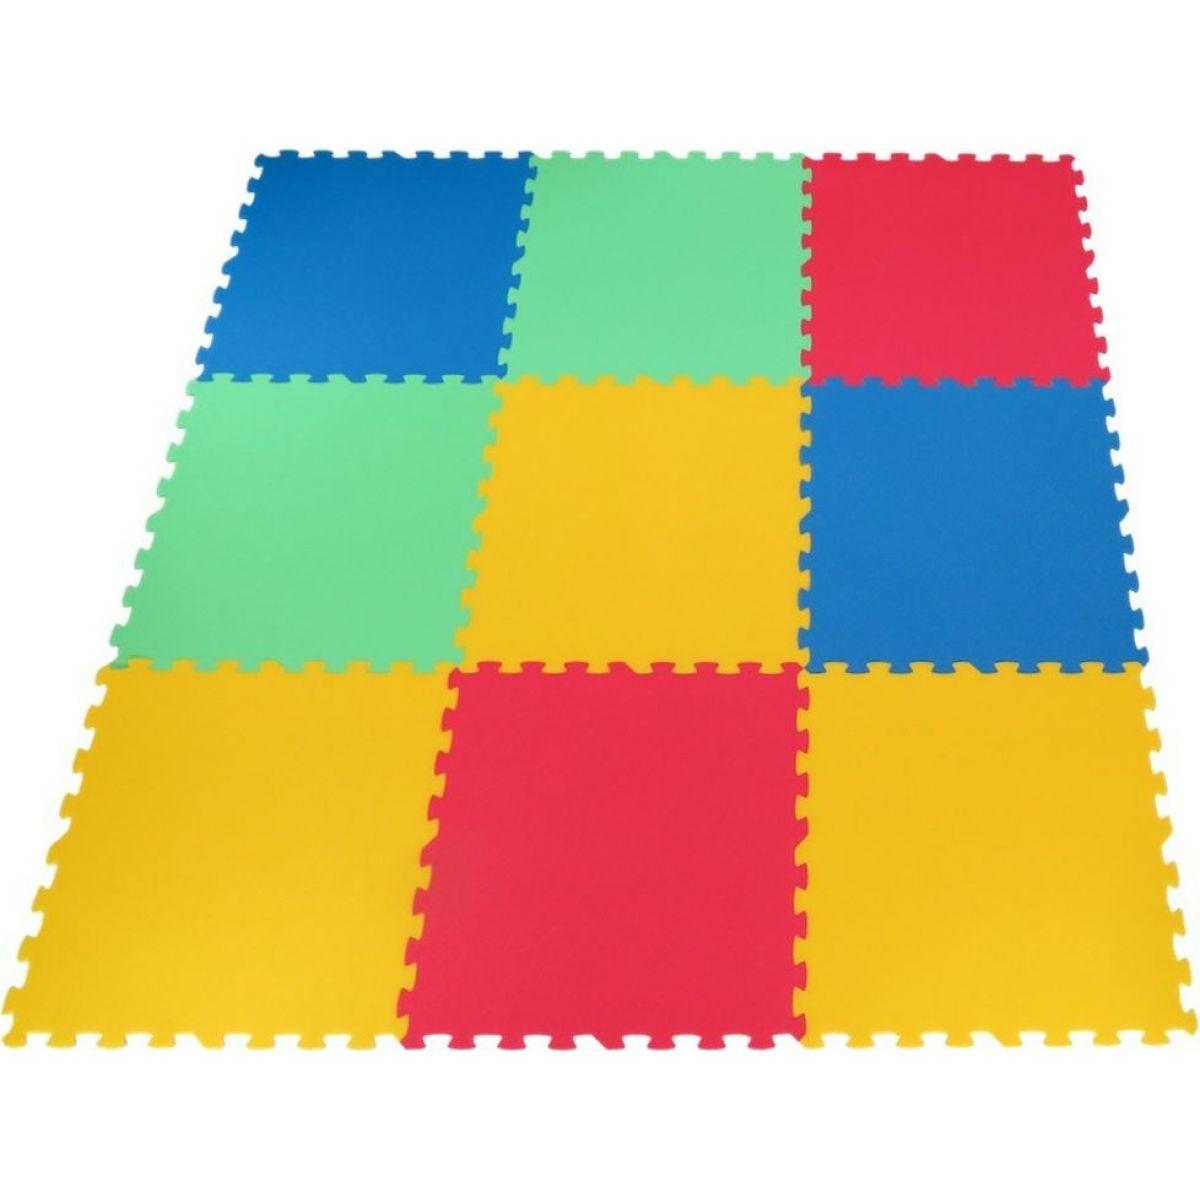 Malý Génius Pěnový koberec 9 dílů 8 mm